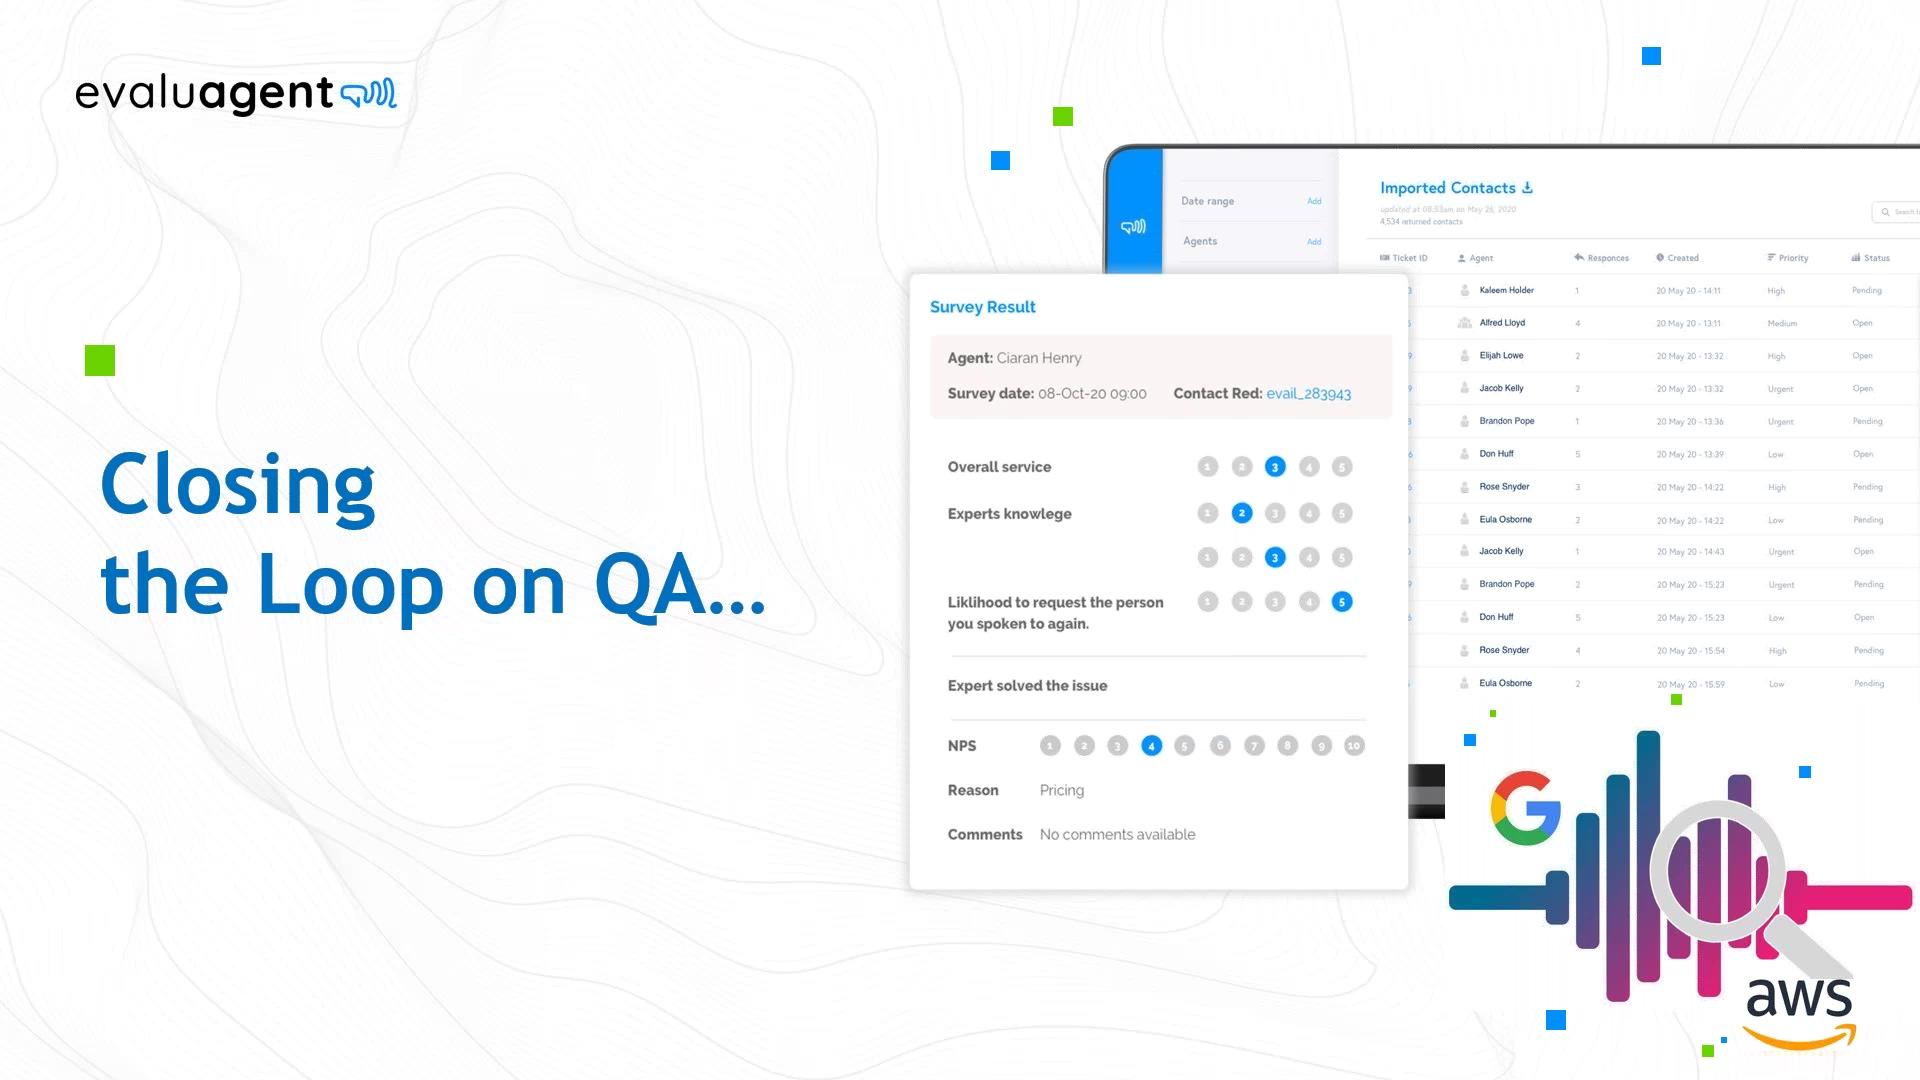 _Smart Quality - Closing the loop on QA